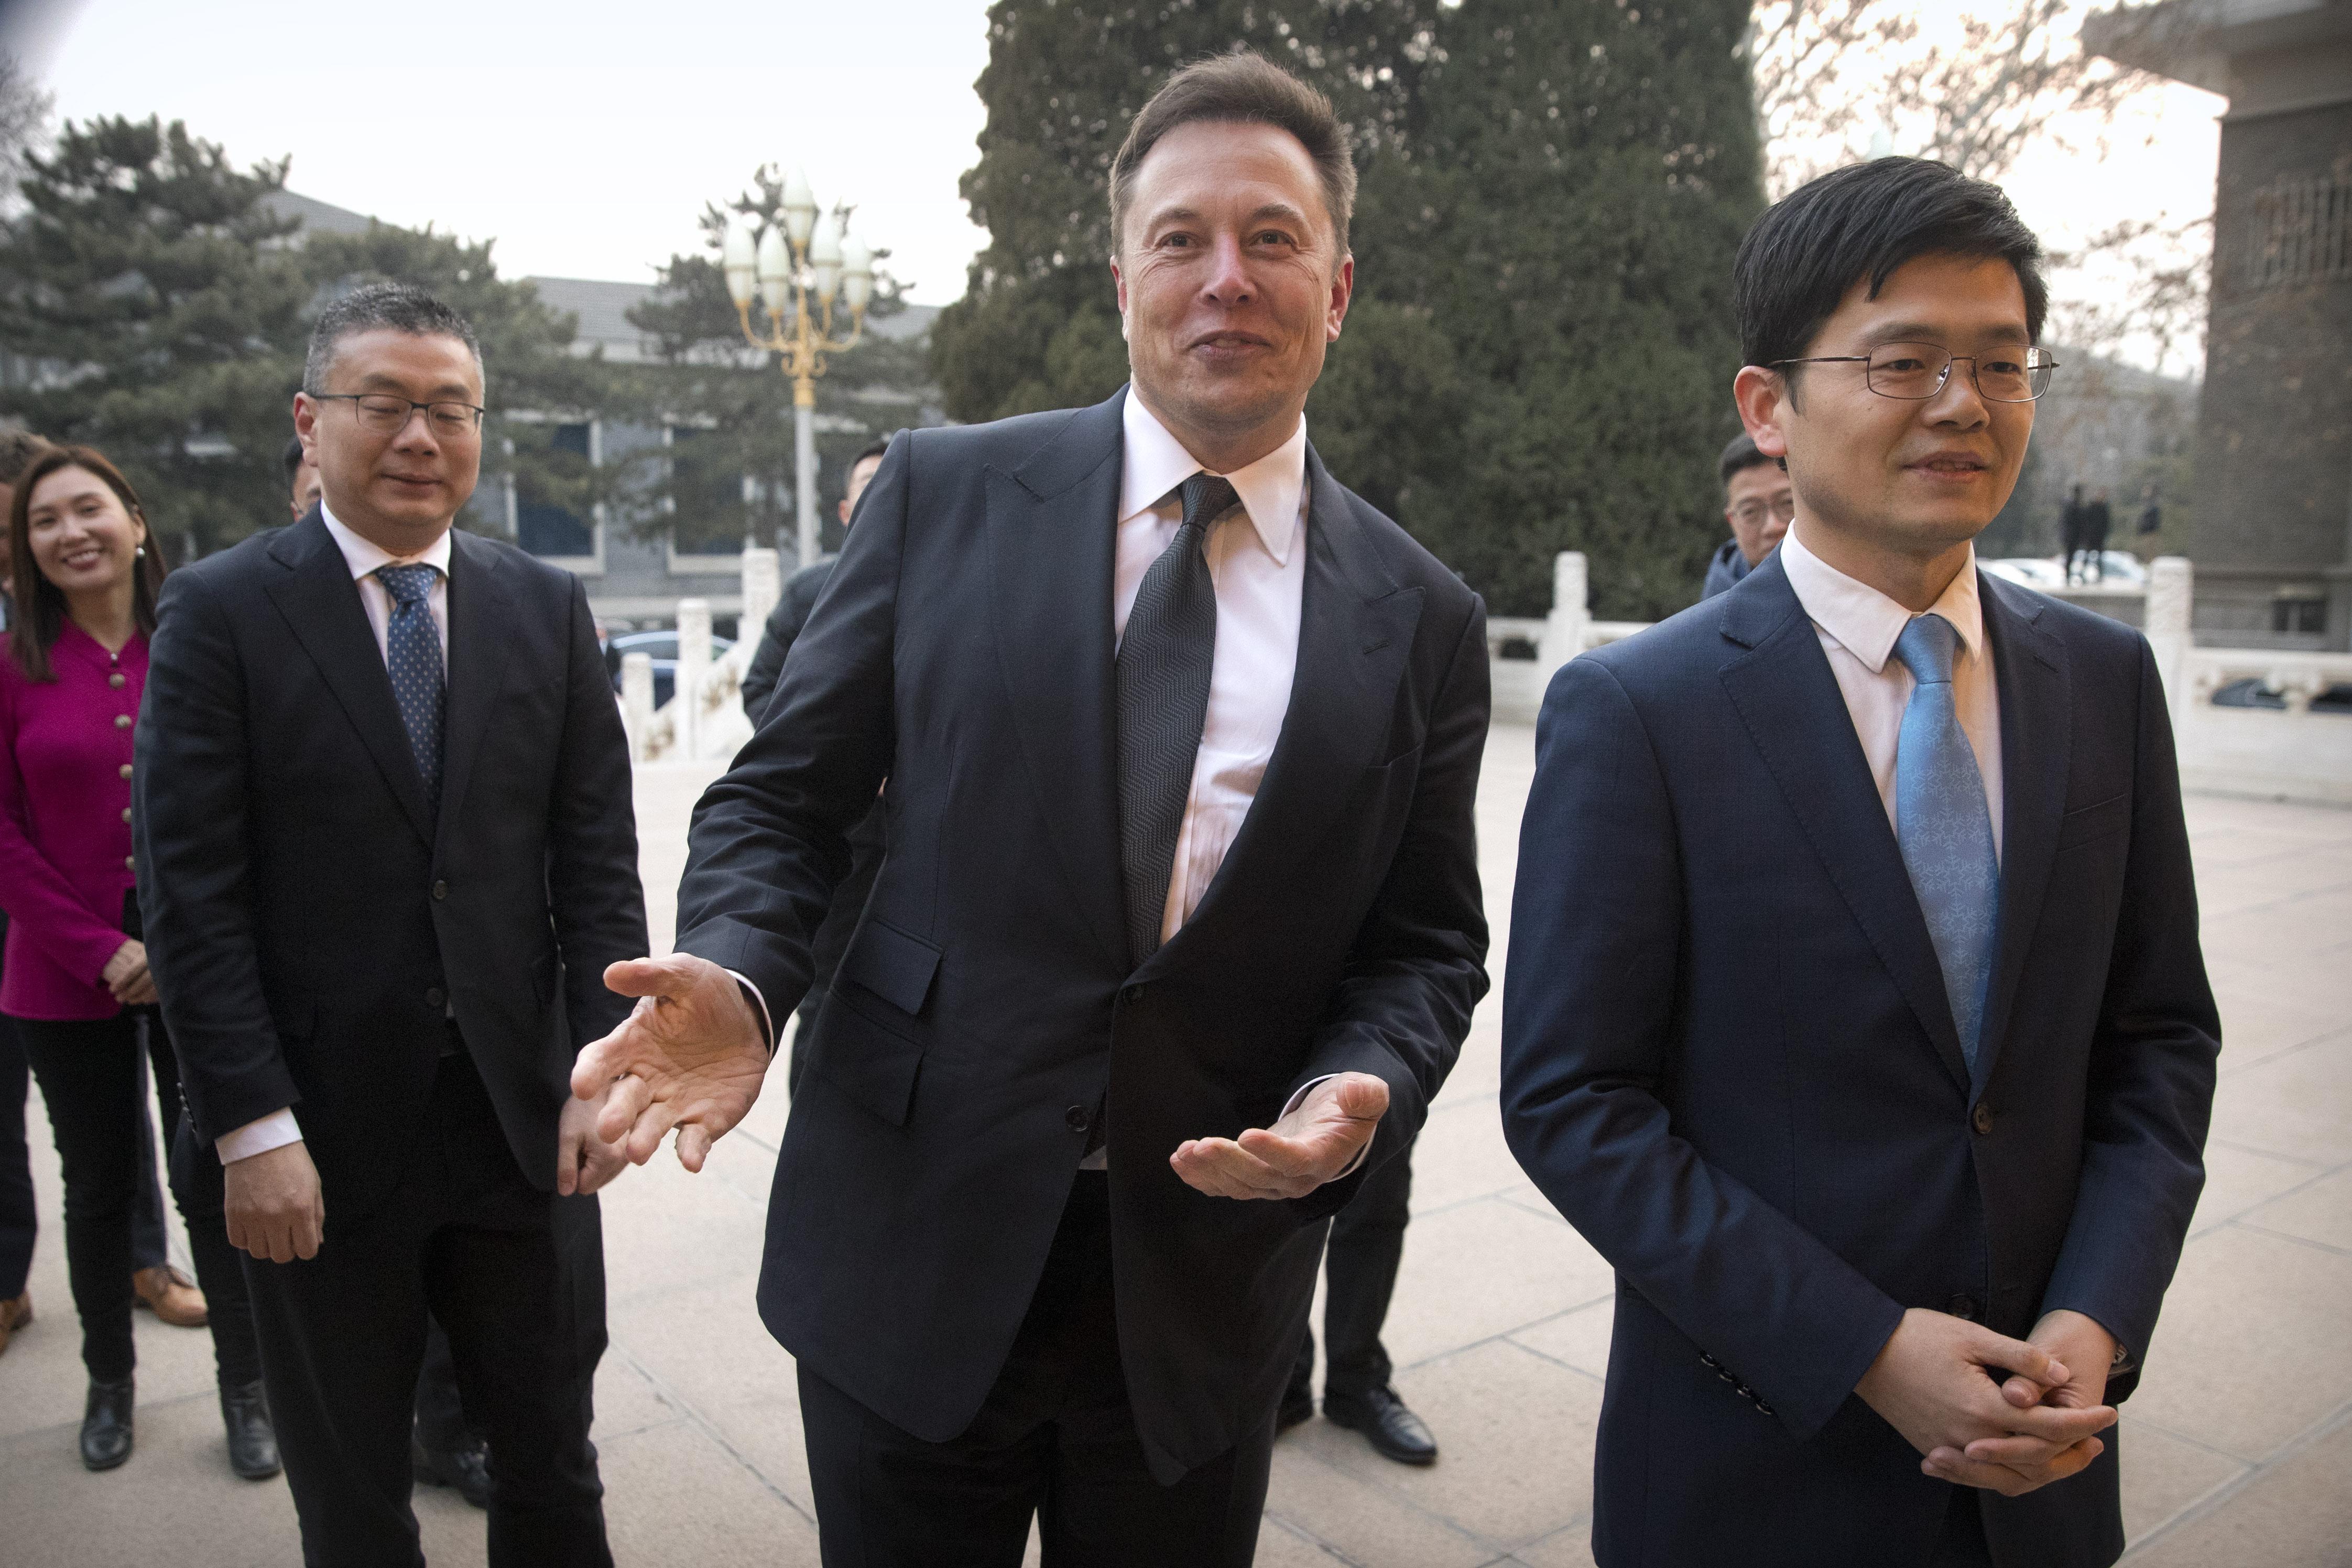 Chinese Premier Li Keqiang Meets Tesla CEO Elon Musk